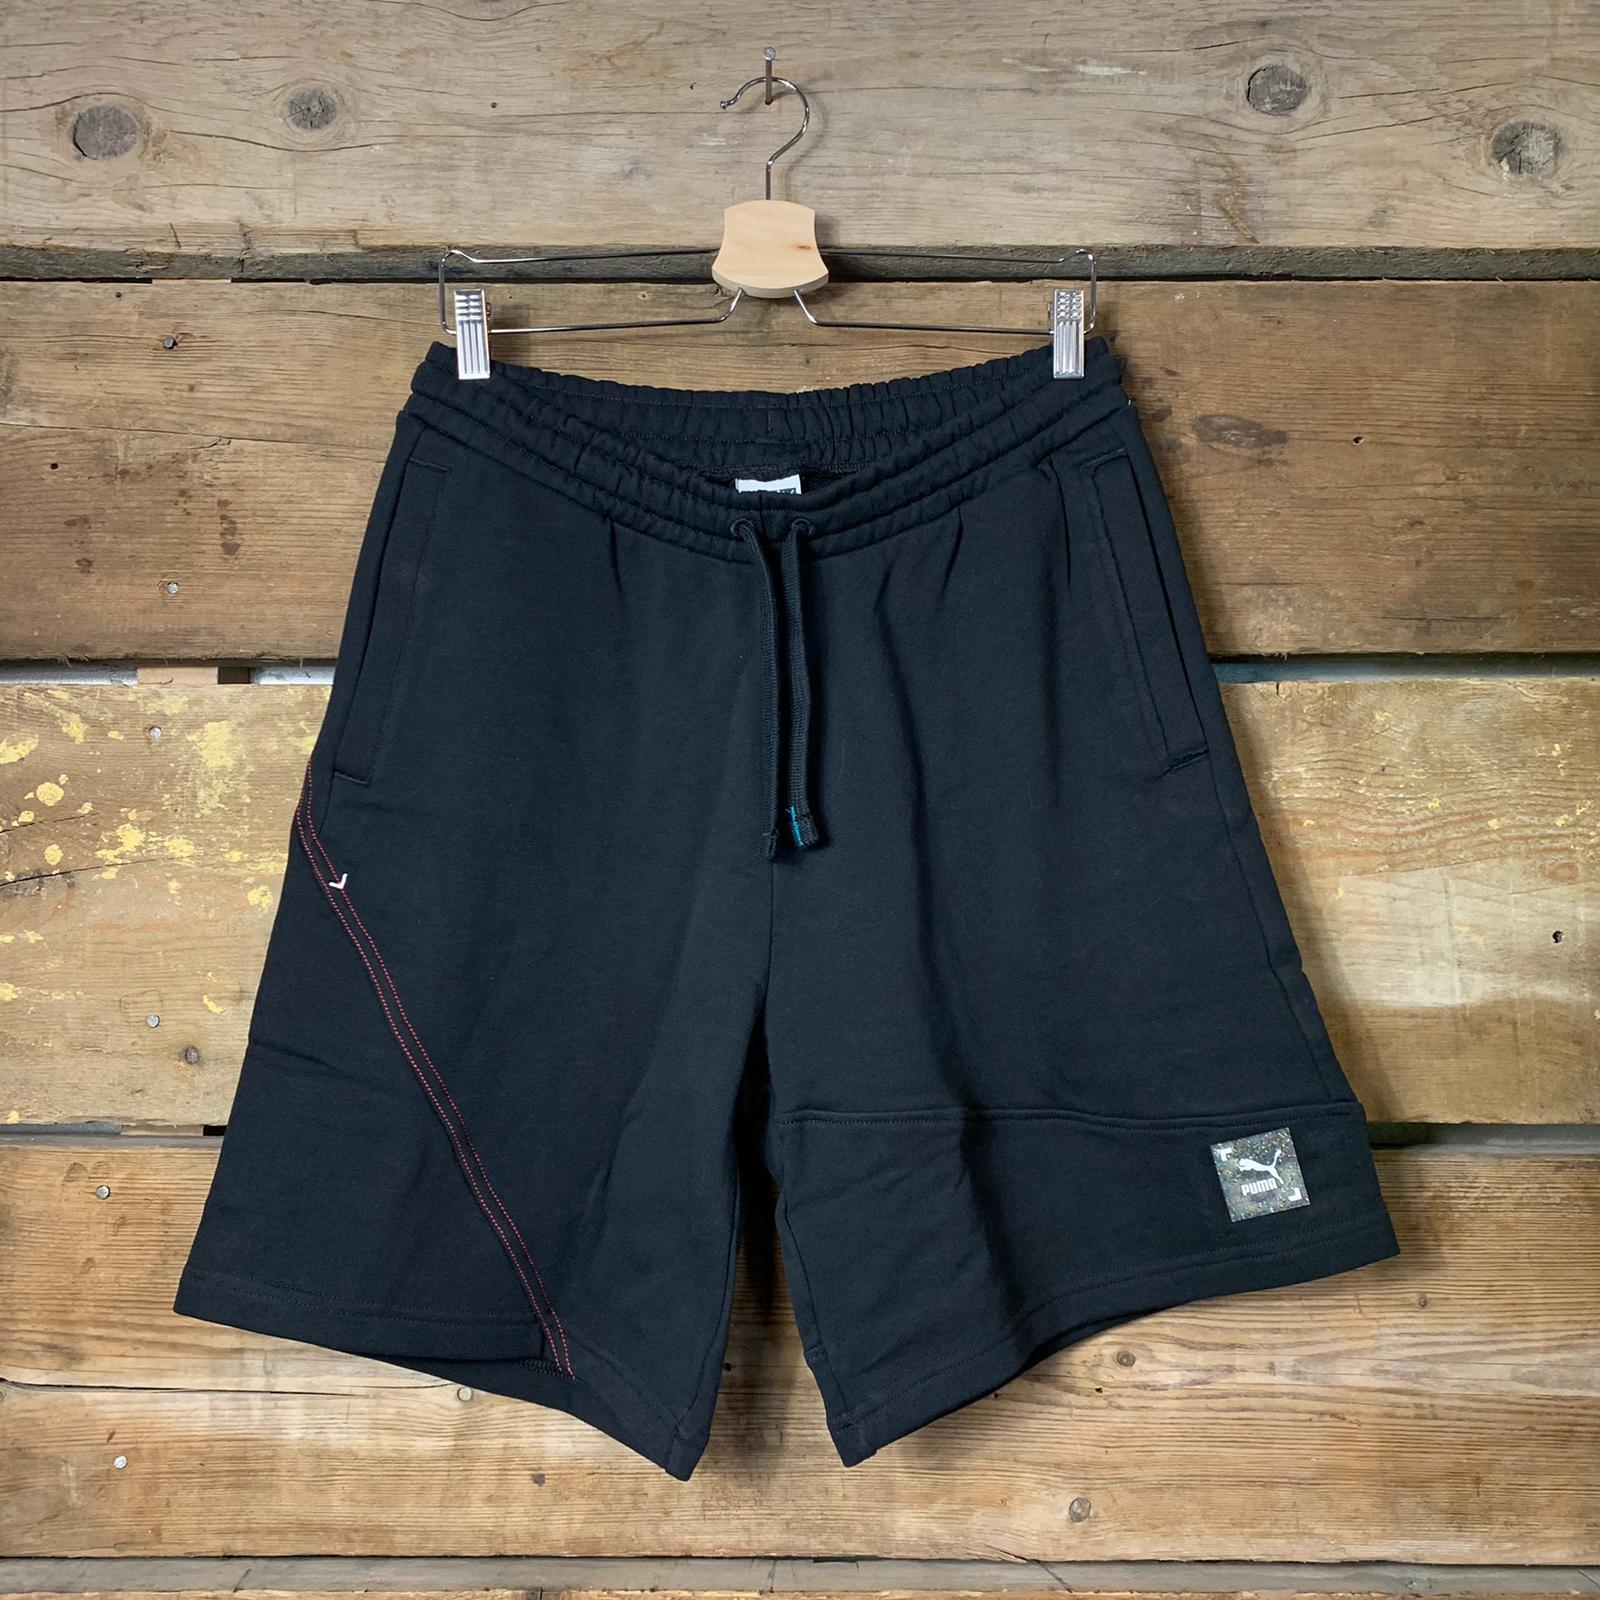 Pantaloncino Puma Re.Gen Shorts in Cotone Nero